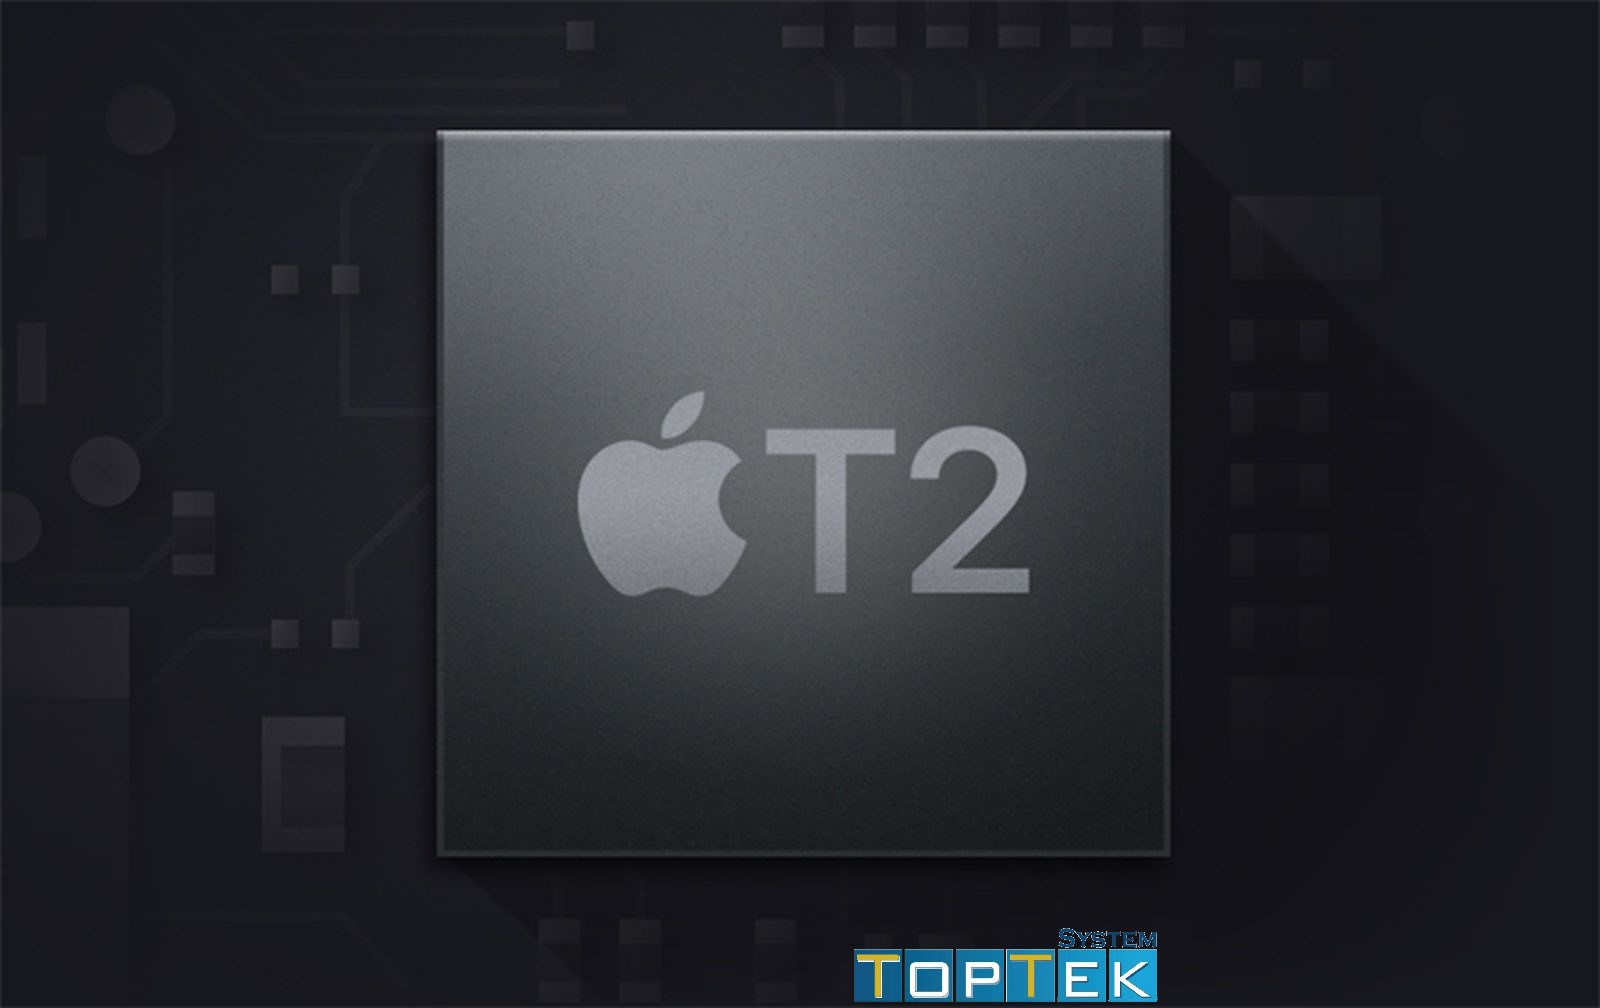 Toptek T2 Security Chip